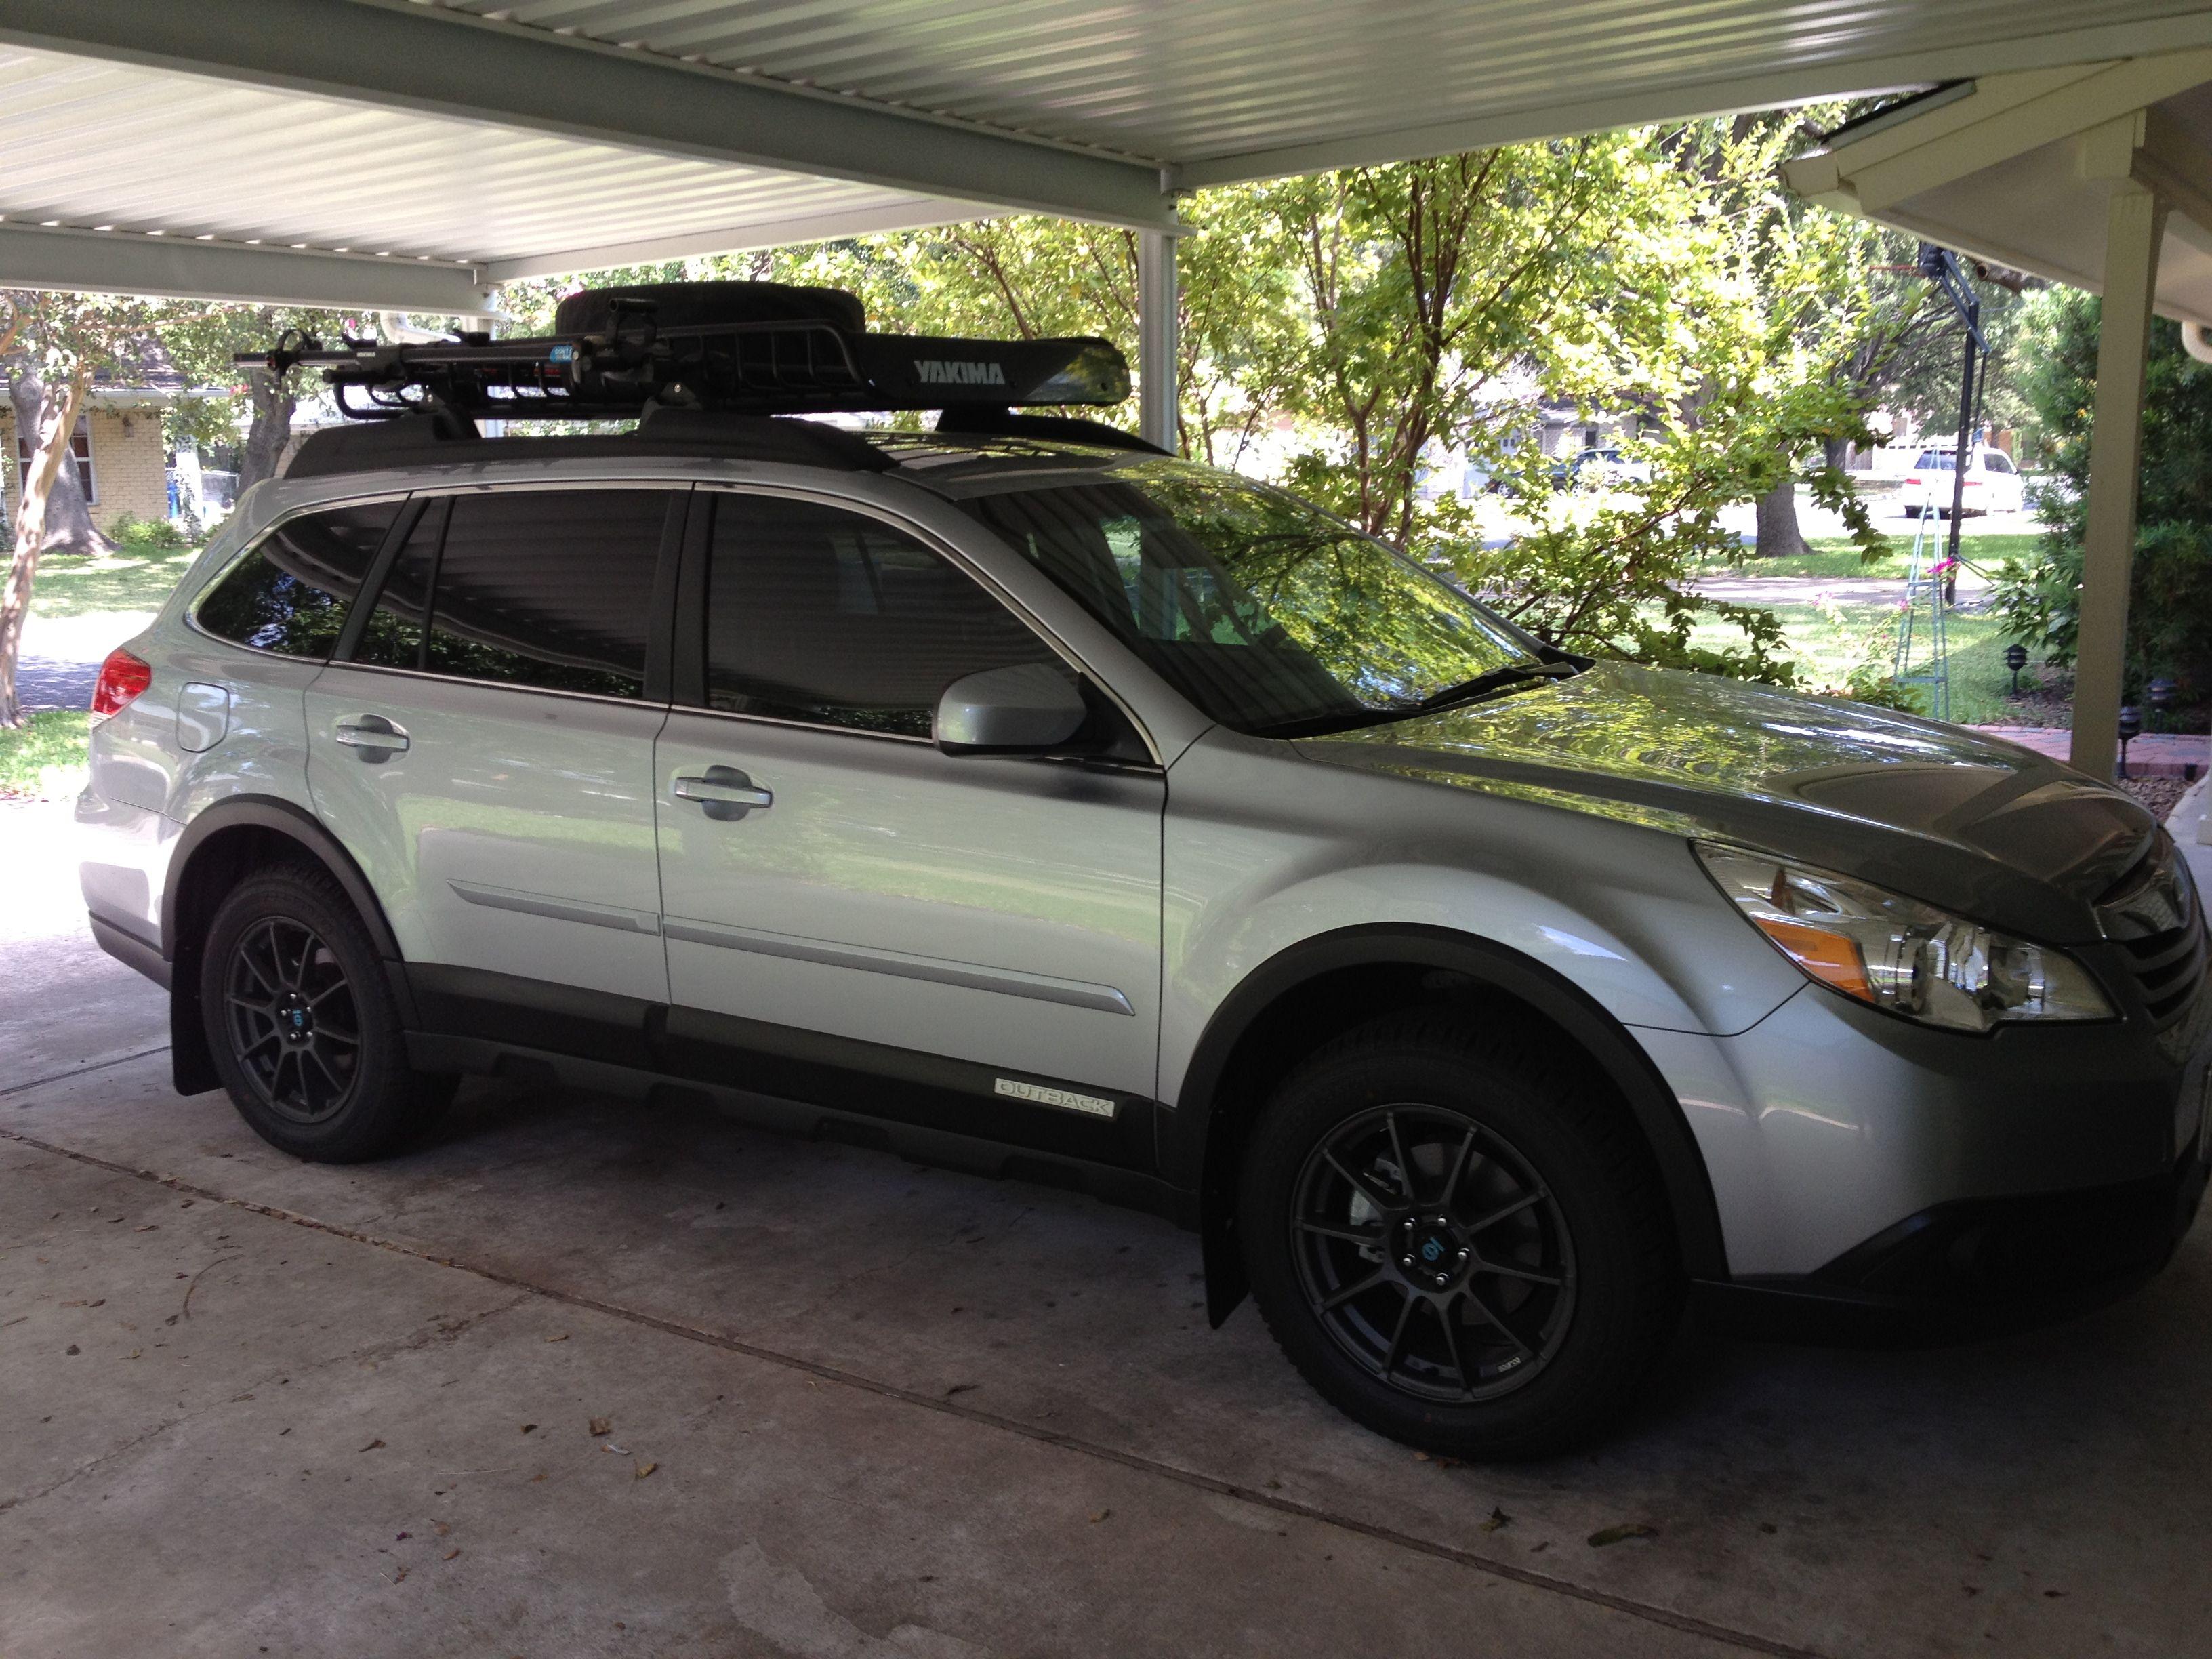 Tough Lookin Outback Right Subaru Outback Subaru Outback Offroad Subaru Outback Accessories